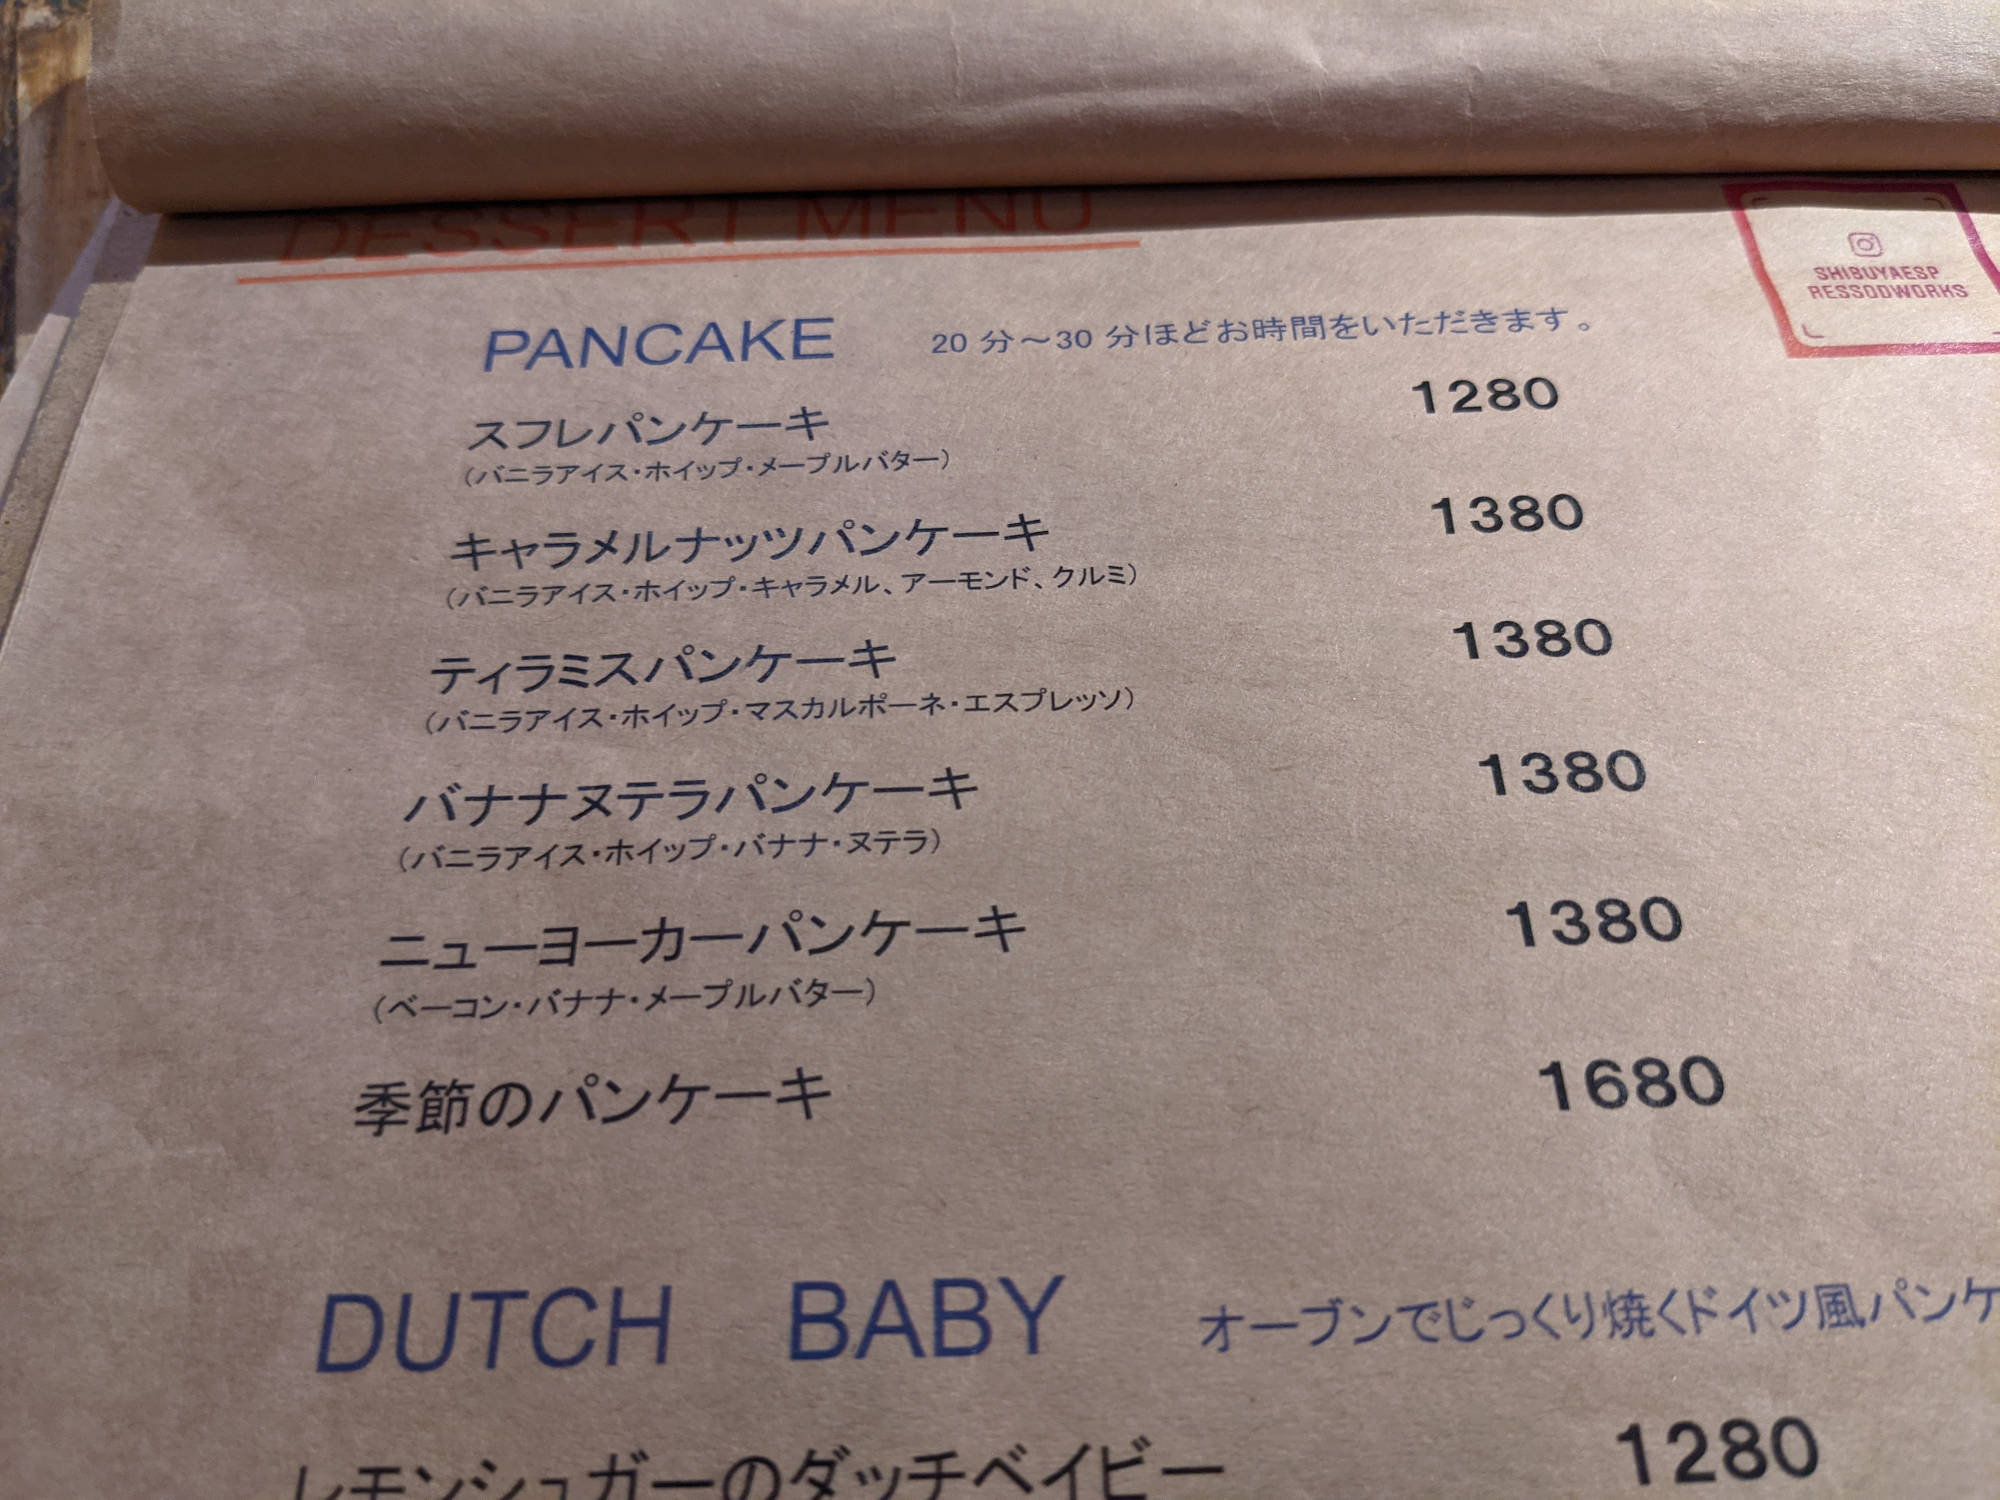 ESPRESSO D WORKS 渋谷のパンケーキのメニュー